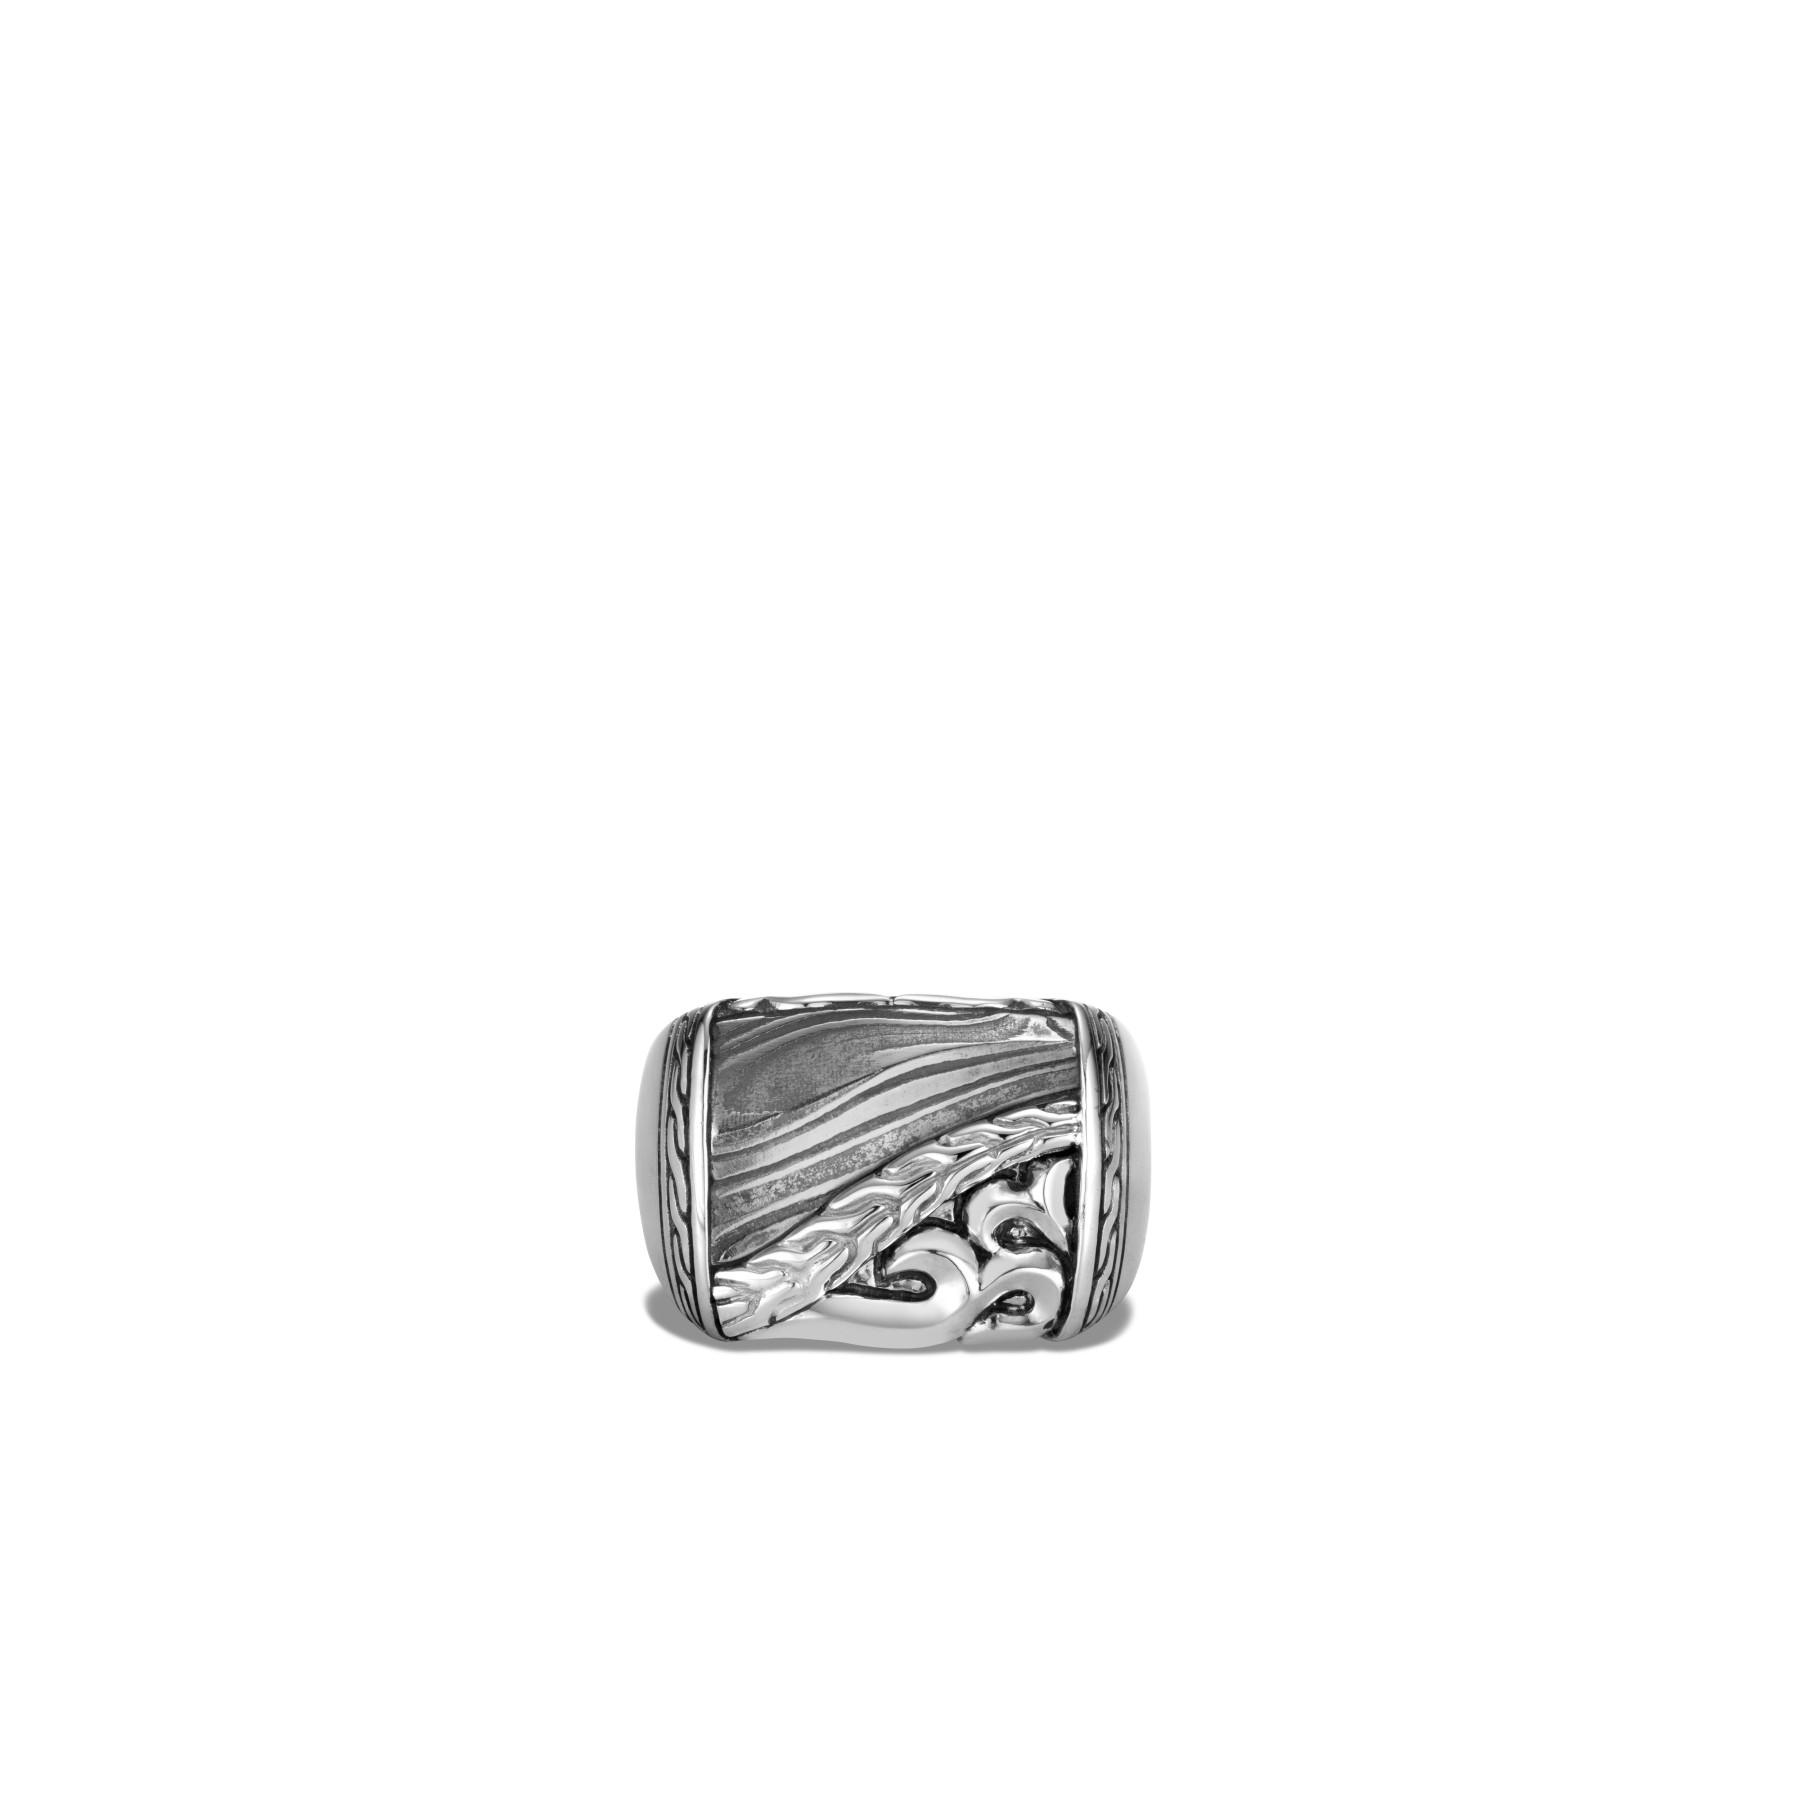 John Hardy Classic Chain Damascus Steel Ring top view